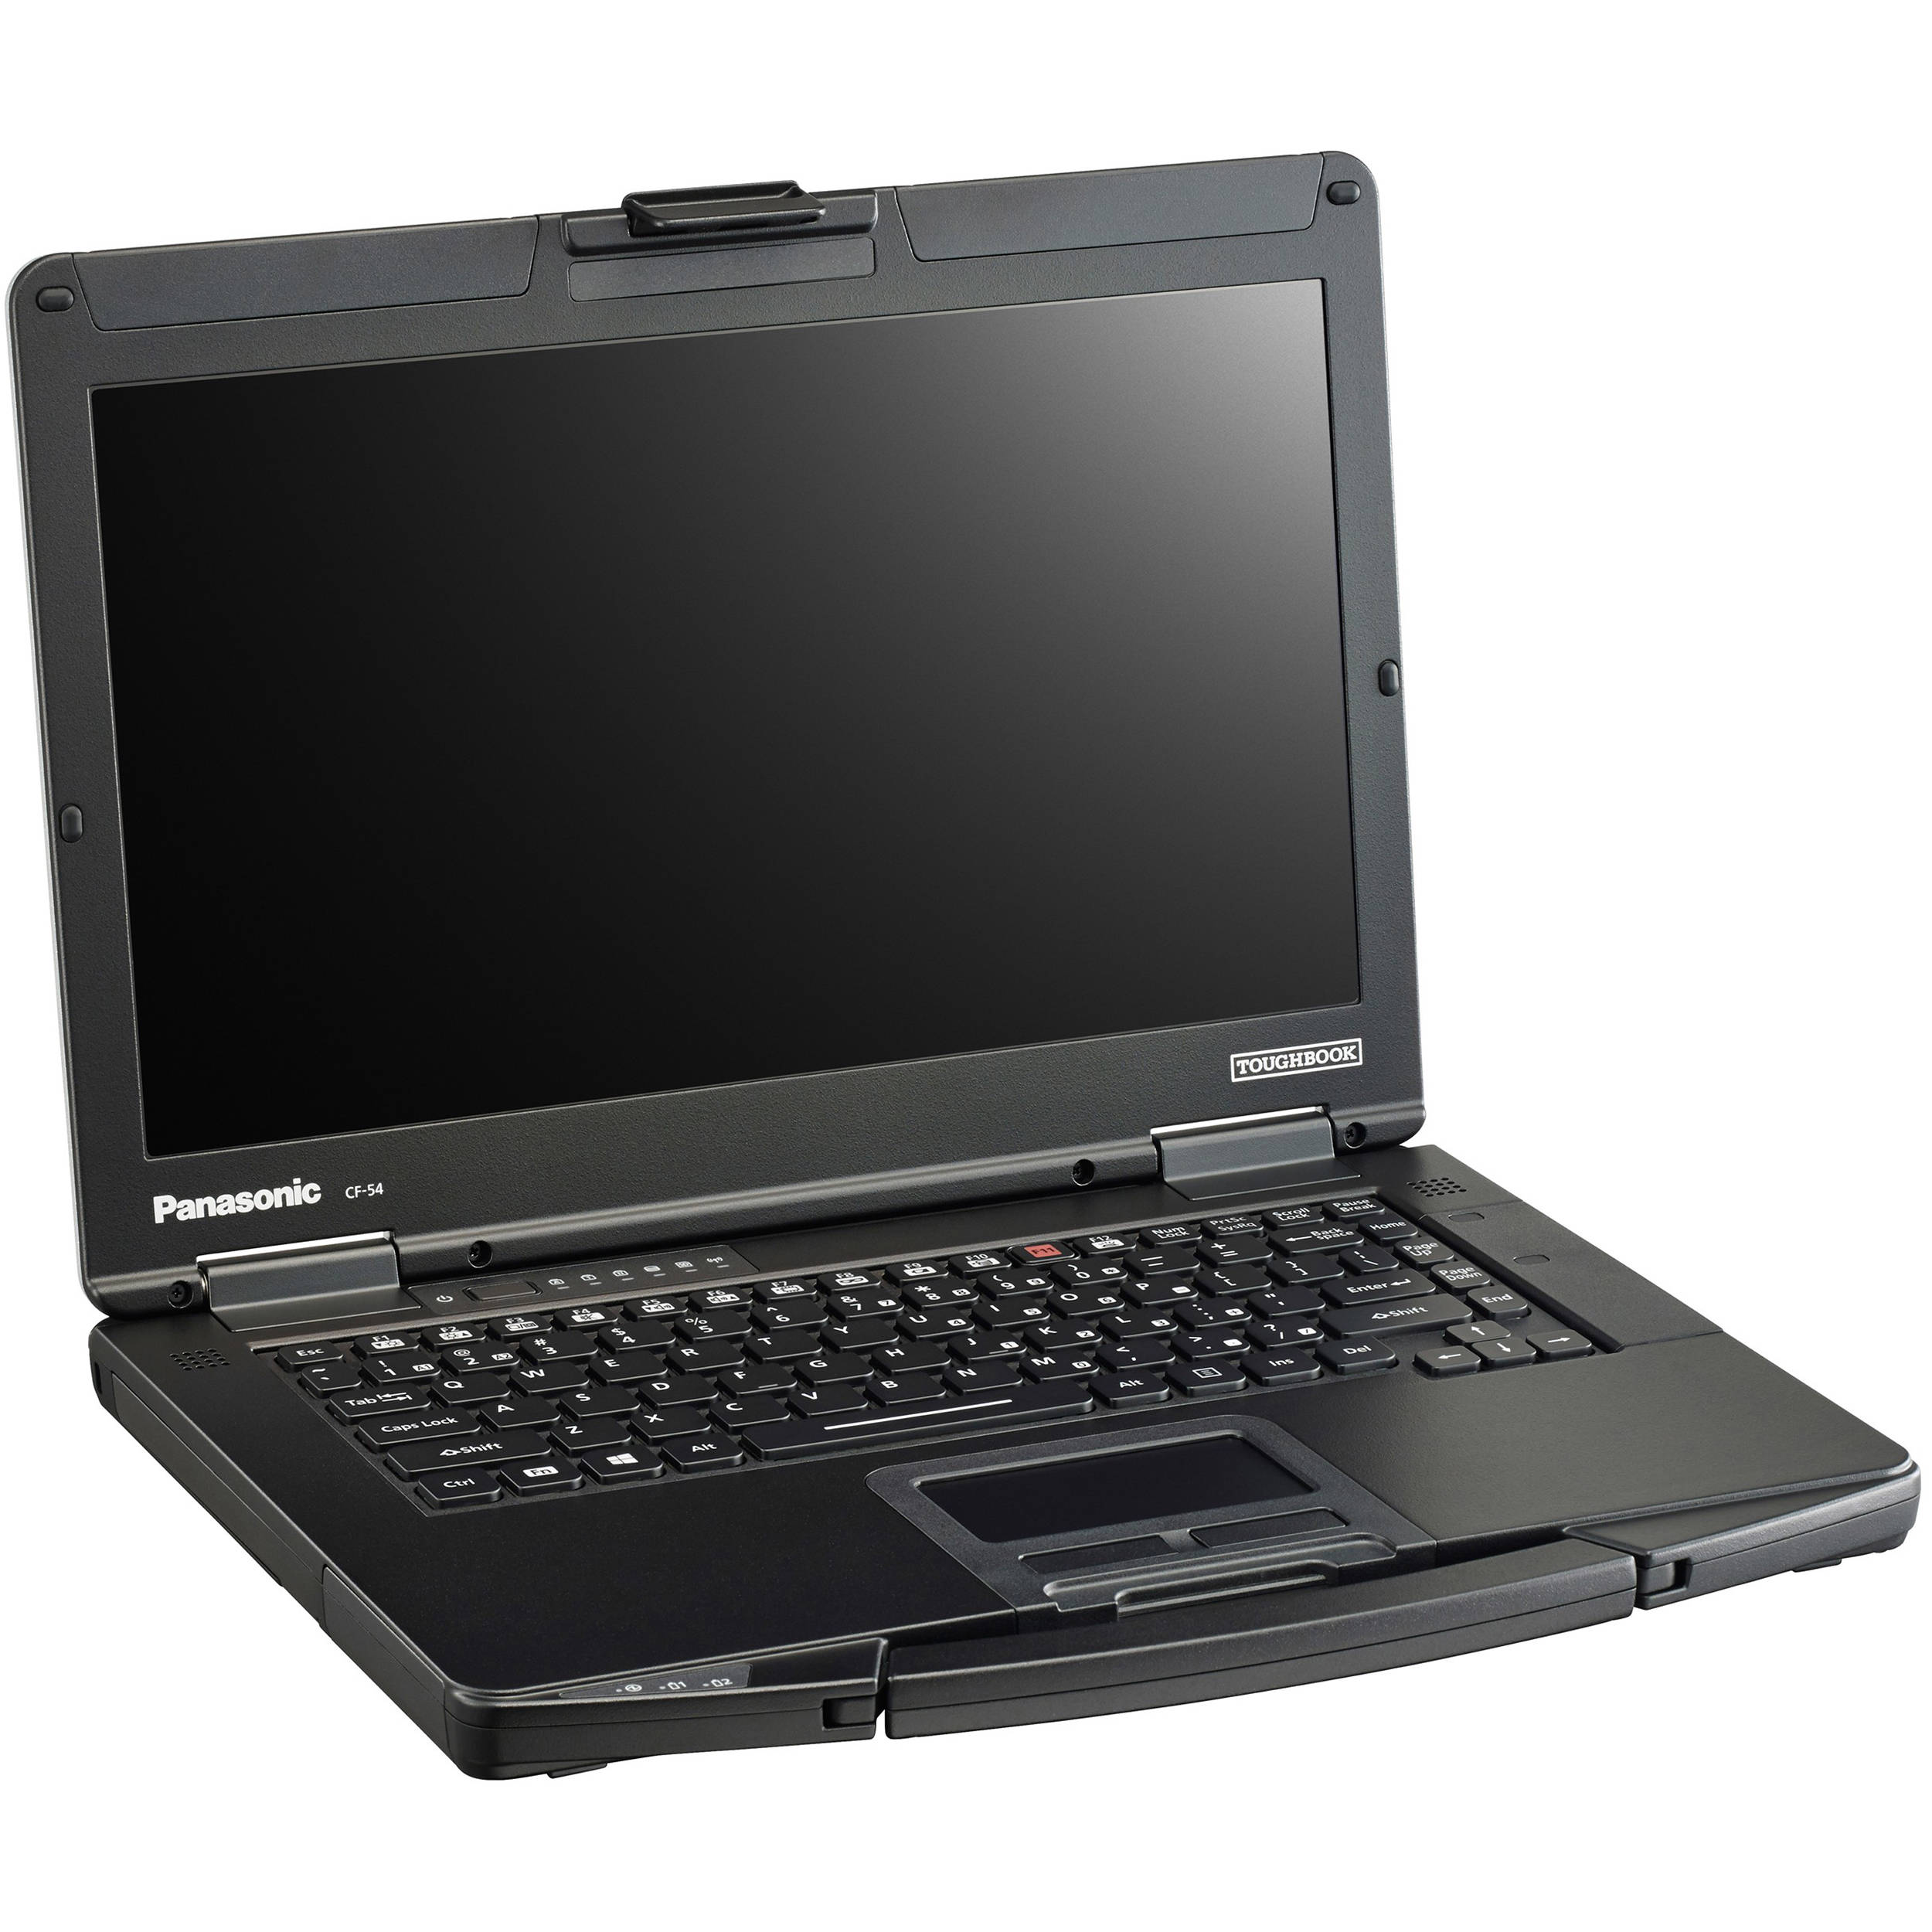 Panasonic 14 Toughbook 54 Semi Rugged Laptop